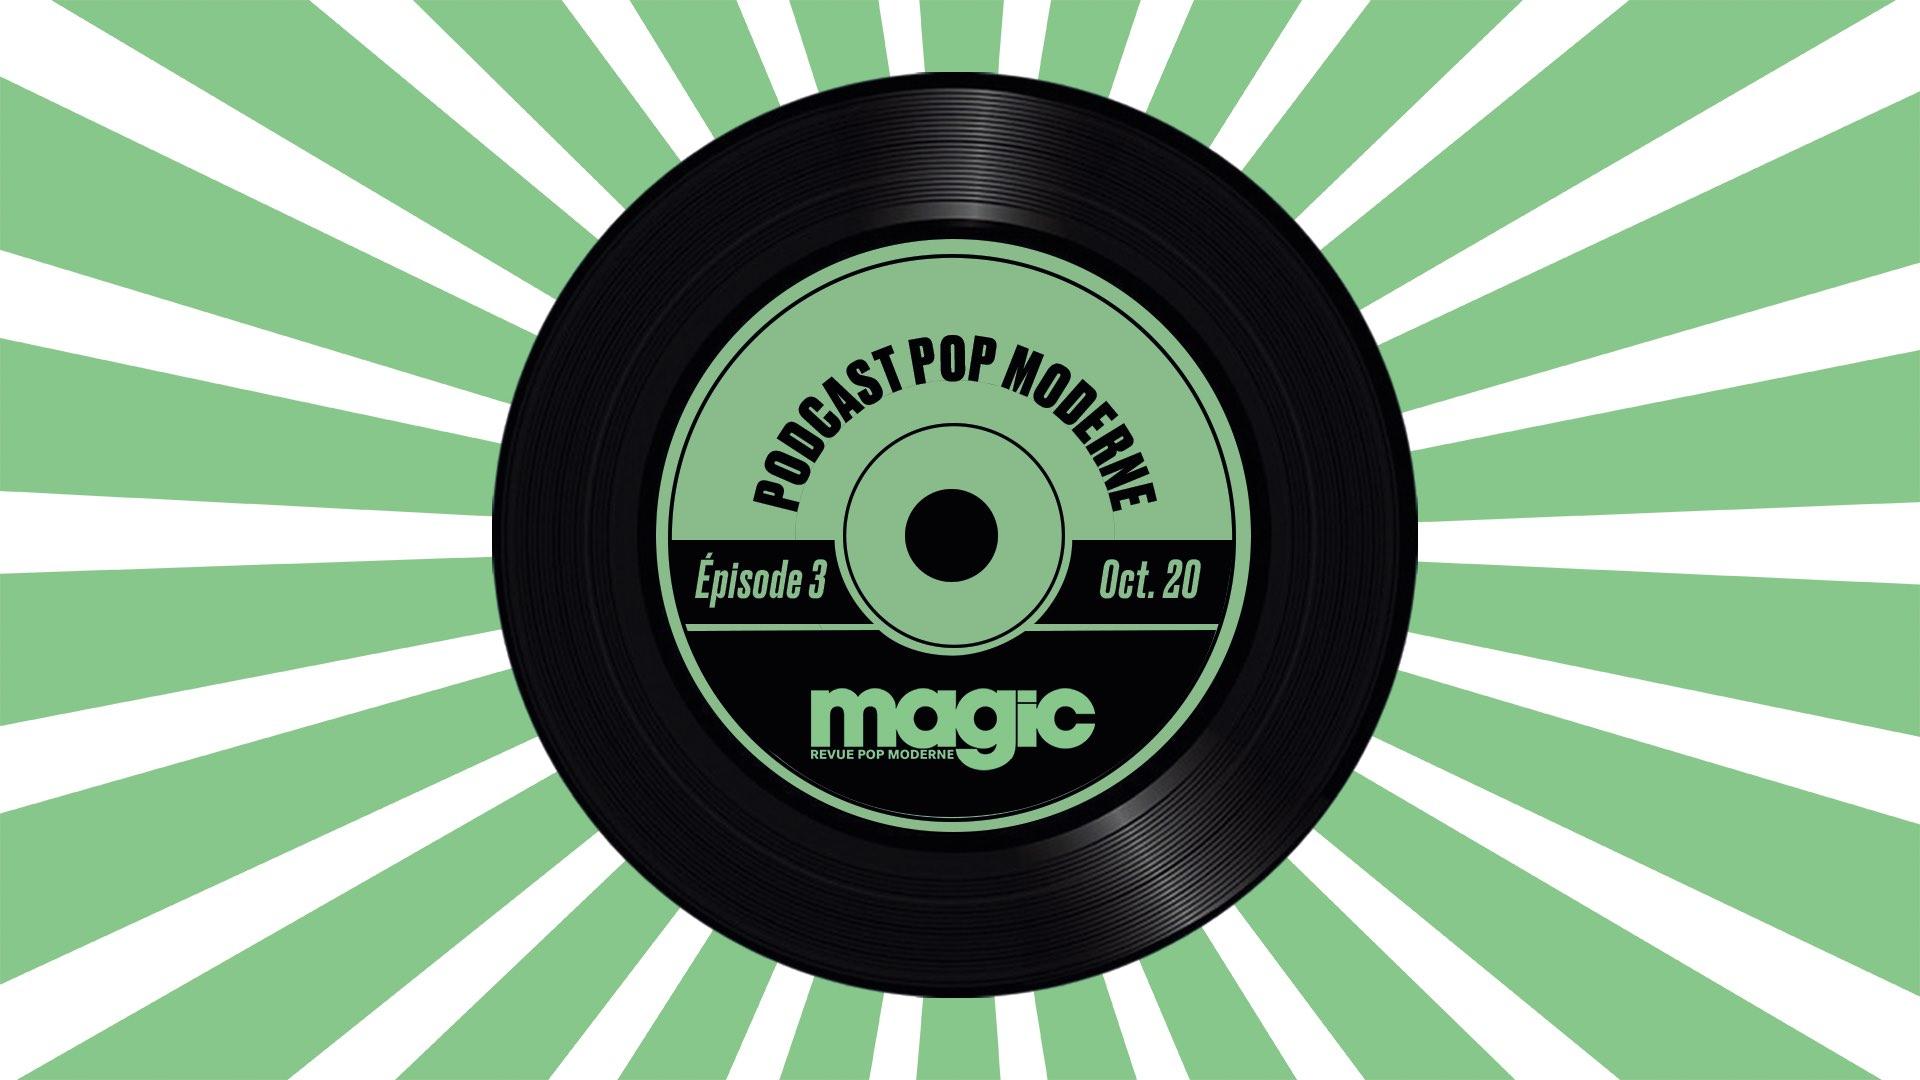 Popcast pop moderne #3 (Magic)